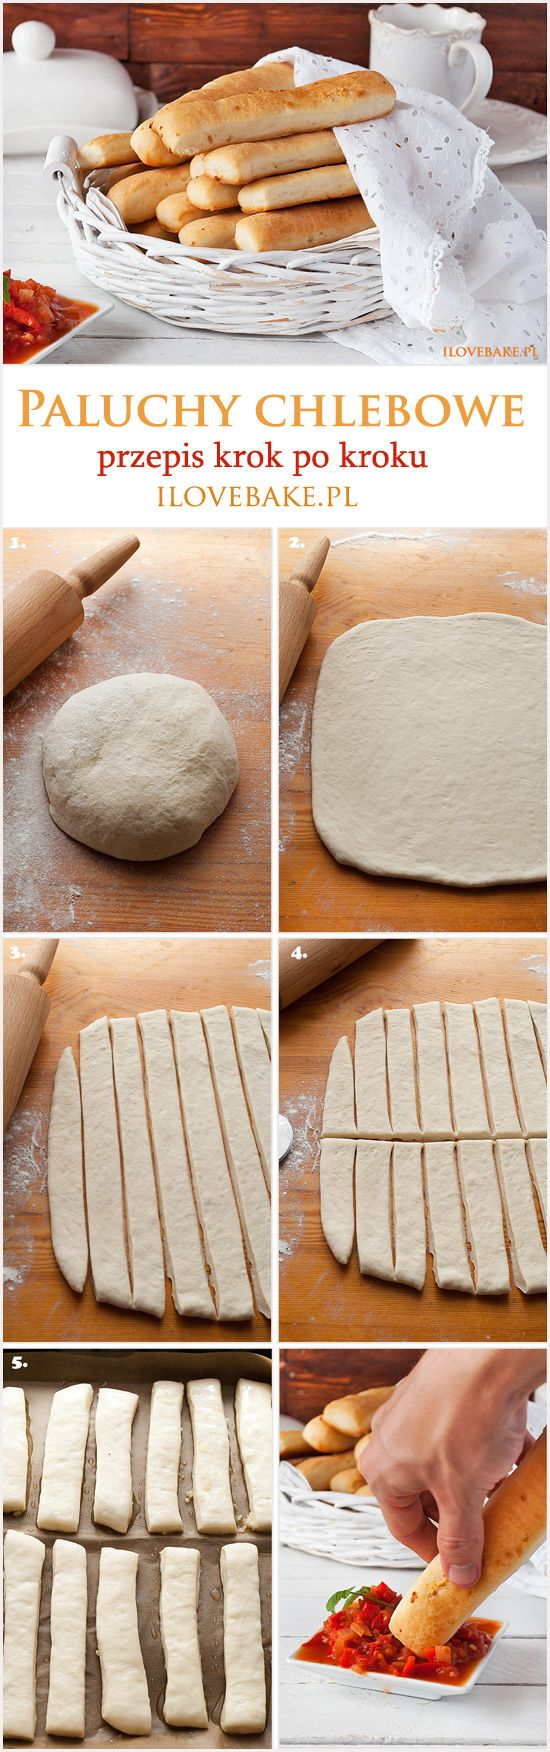 Breadsticks / Paluchy chlebowe ilovebake.pl